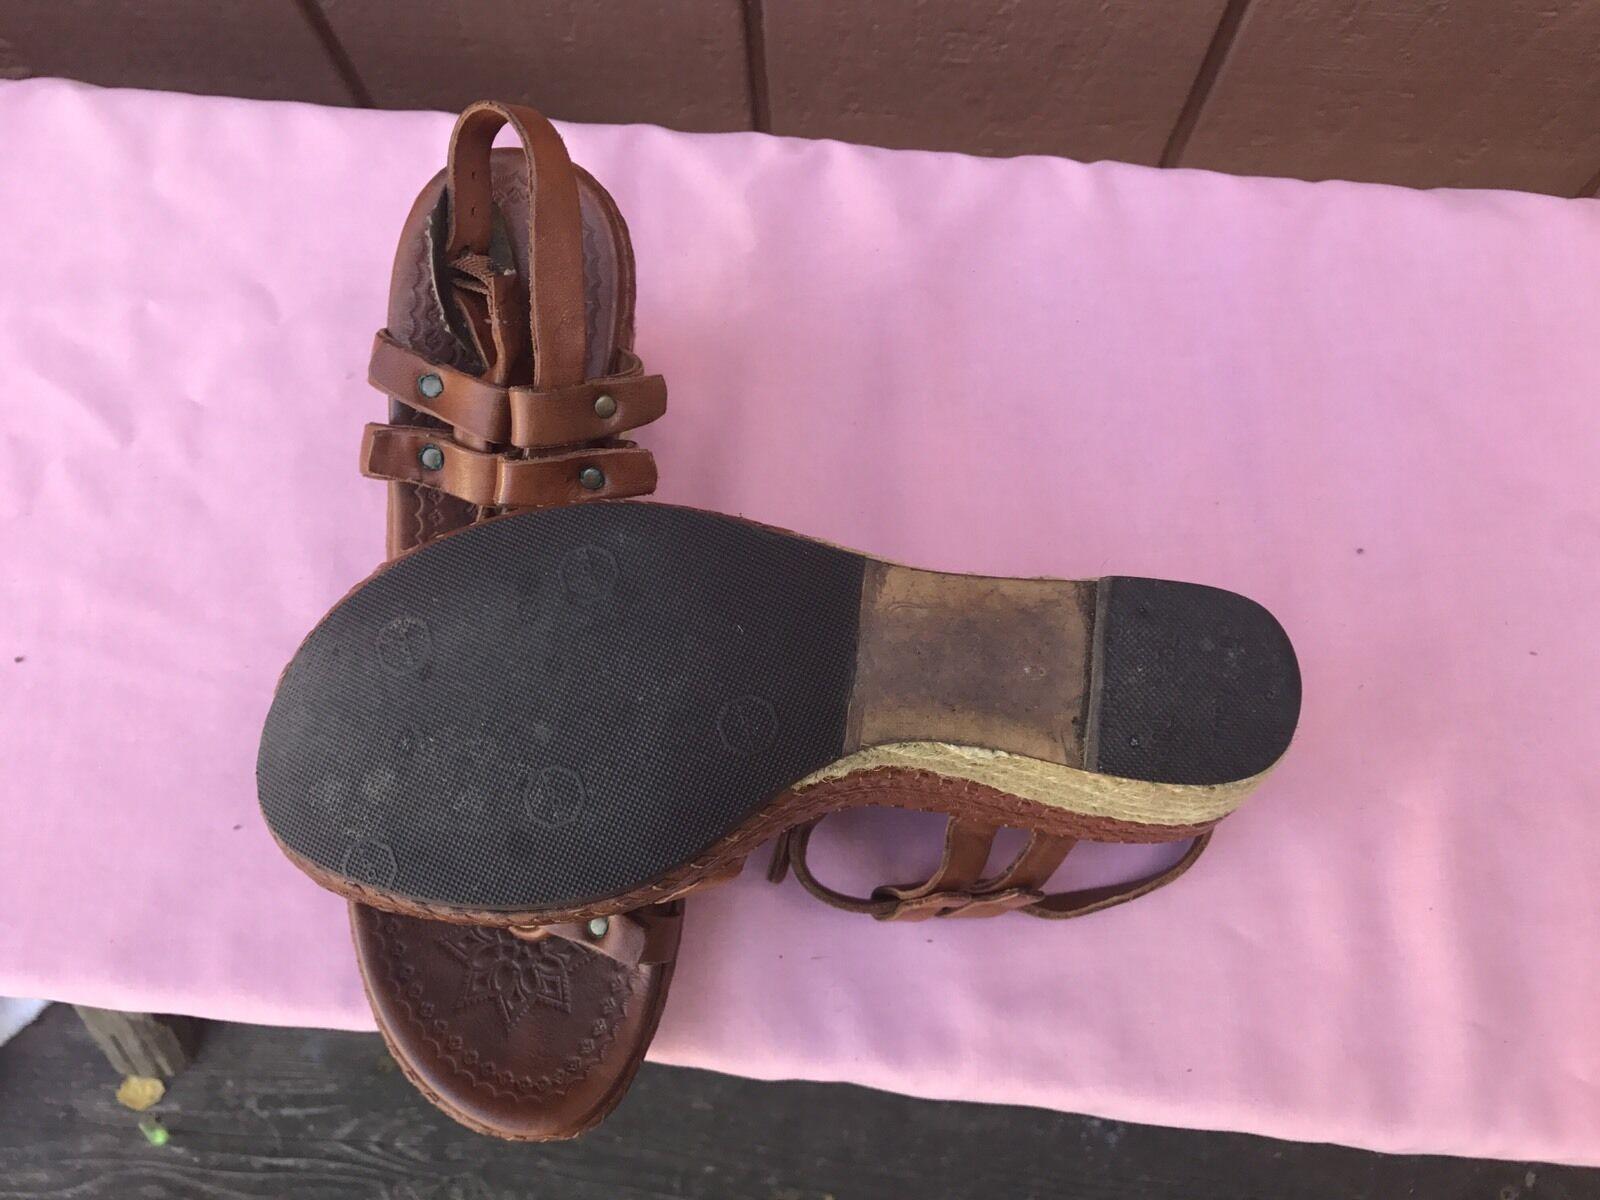 EUC ASH Braun Leder Platform Wedge Sandale EUR 6 36 US 5.5 - 6 EUR 537d1a